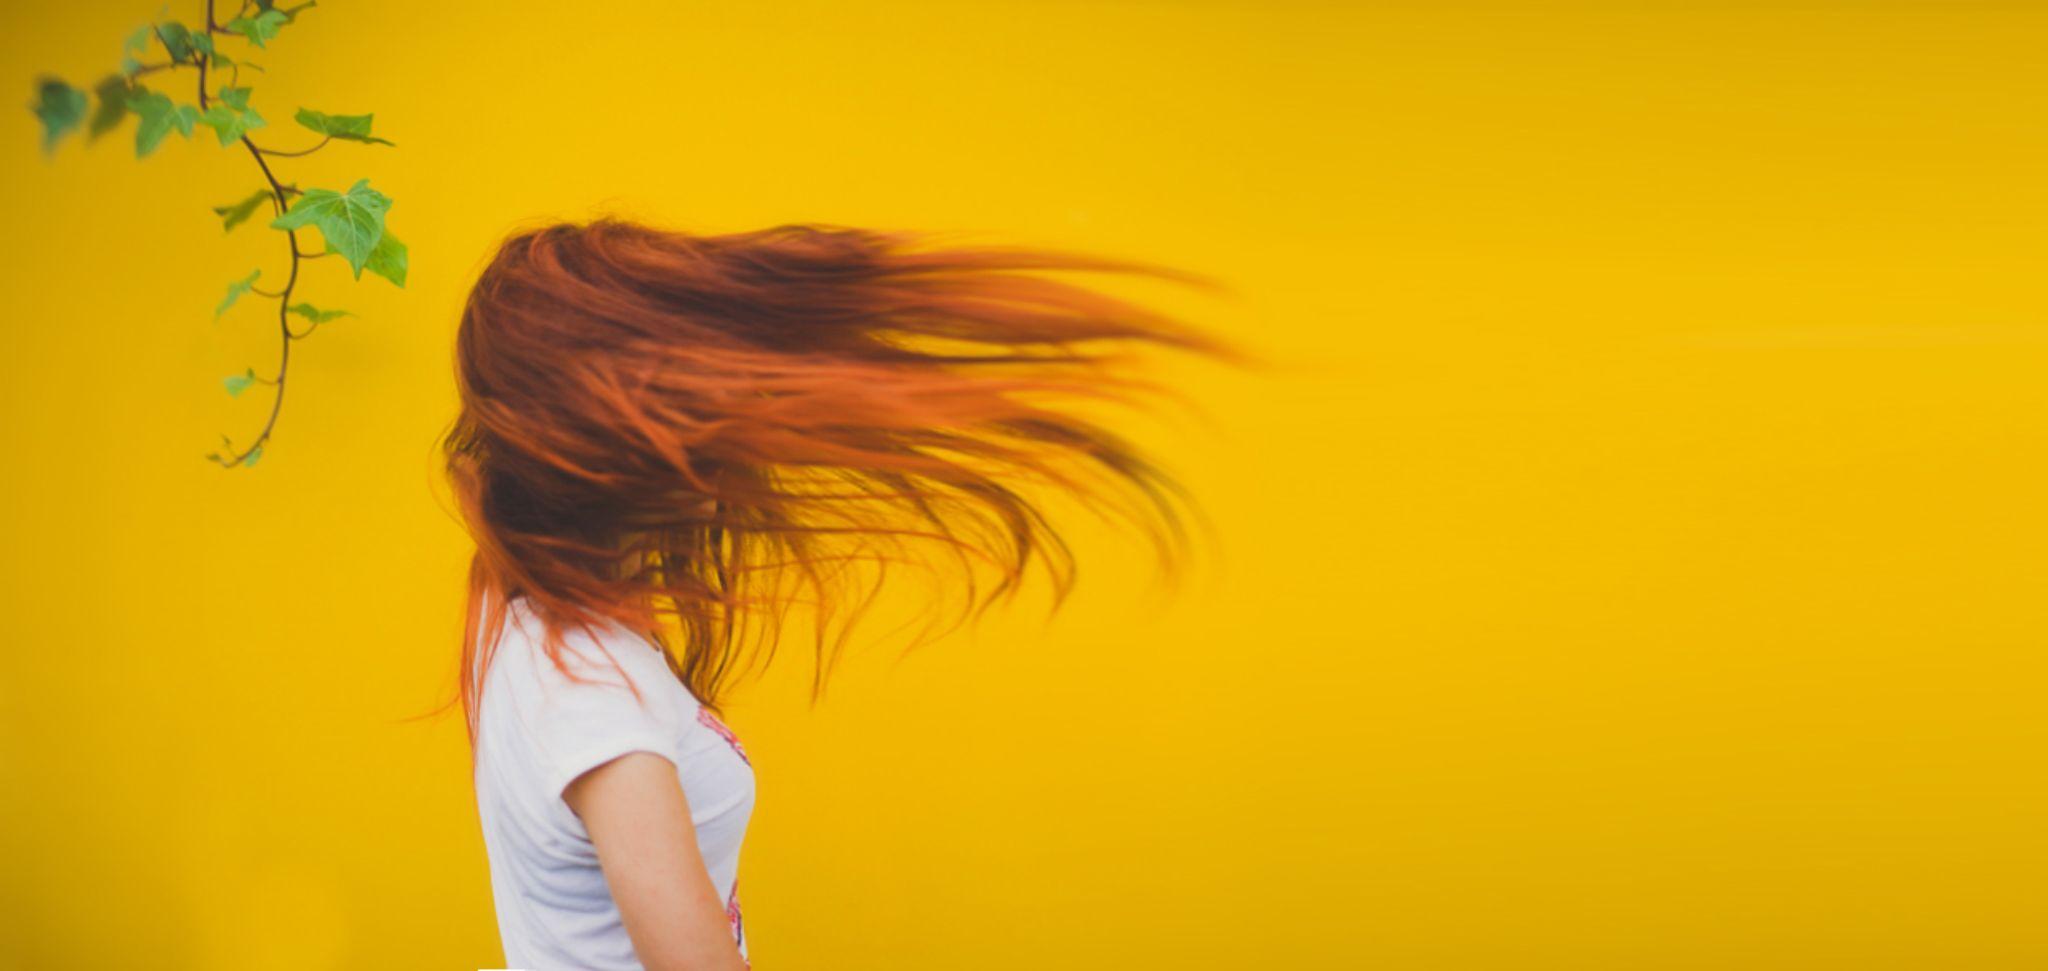 selfportrait by Kristine Kru